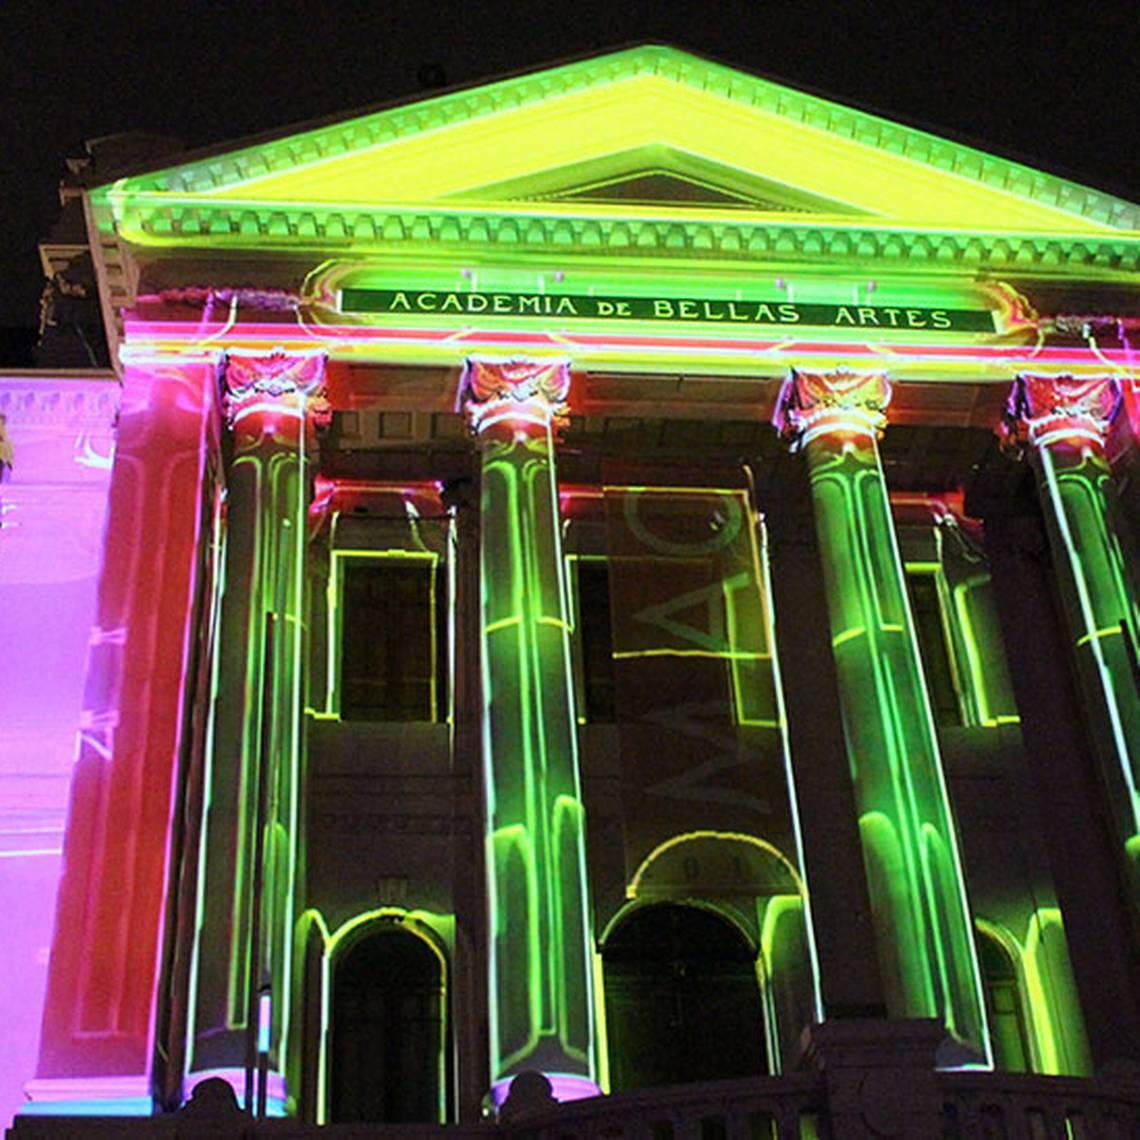 Küzefest: El Primer Festival de Luz llega a Santiago este mes